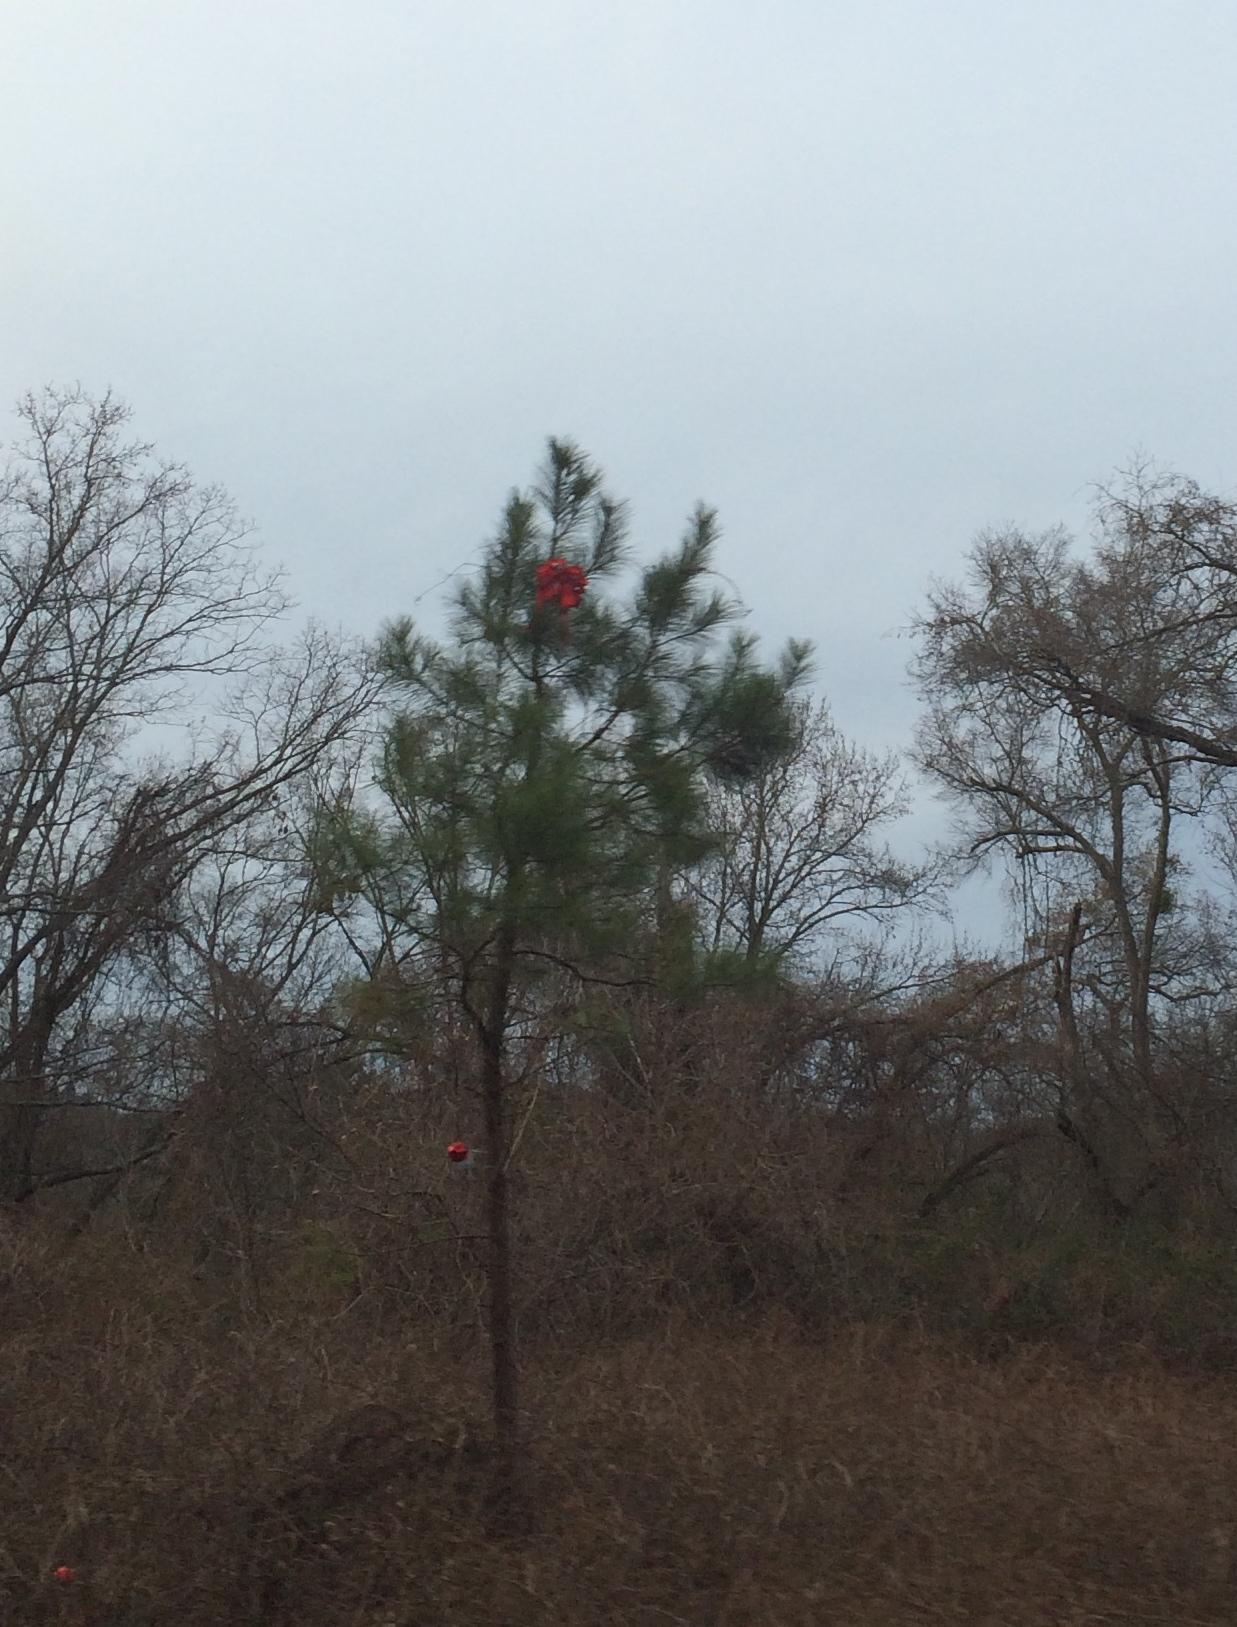 'Charlie Brown Christmas tree' in Trussville brings mystery, joy